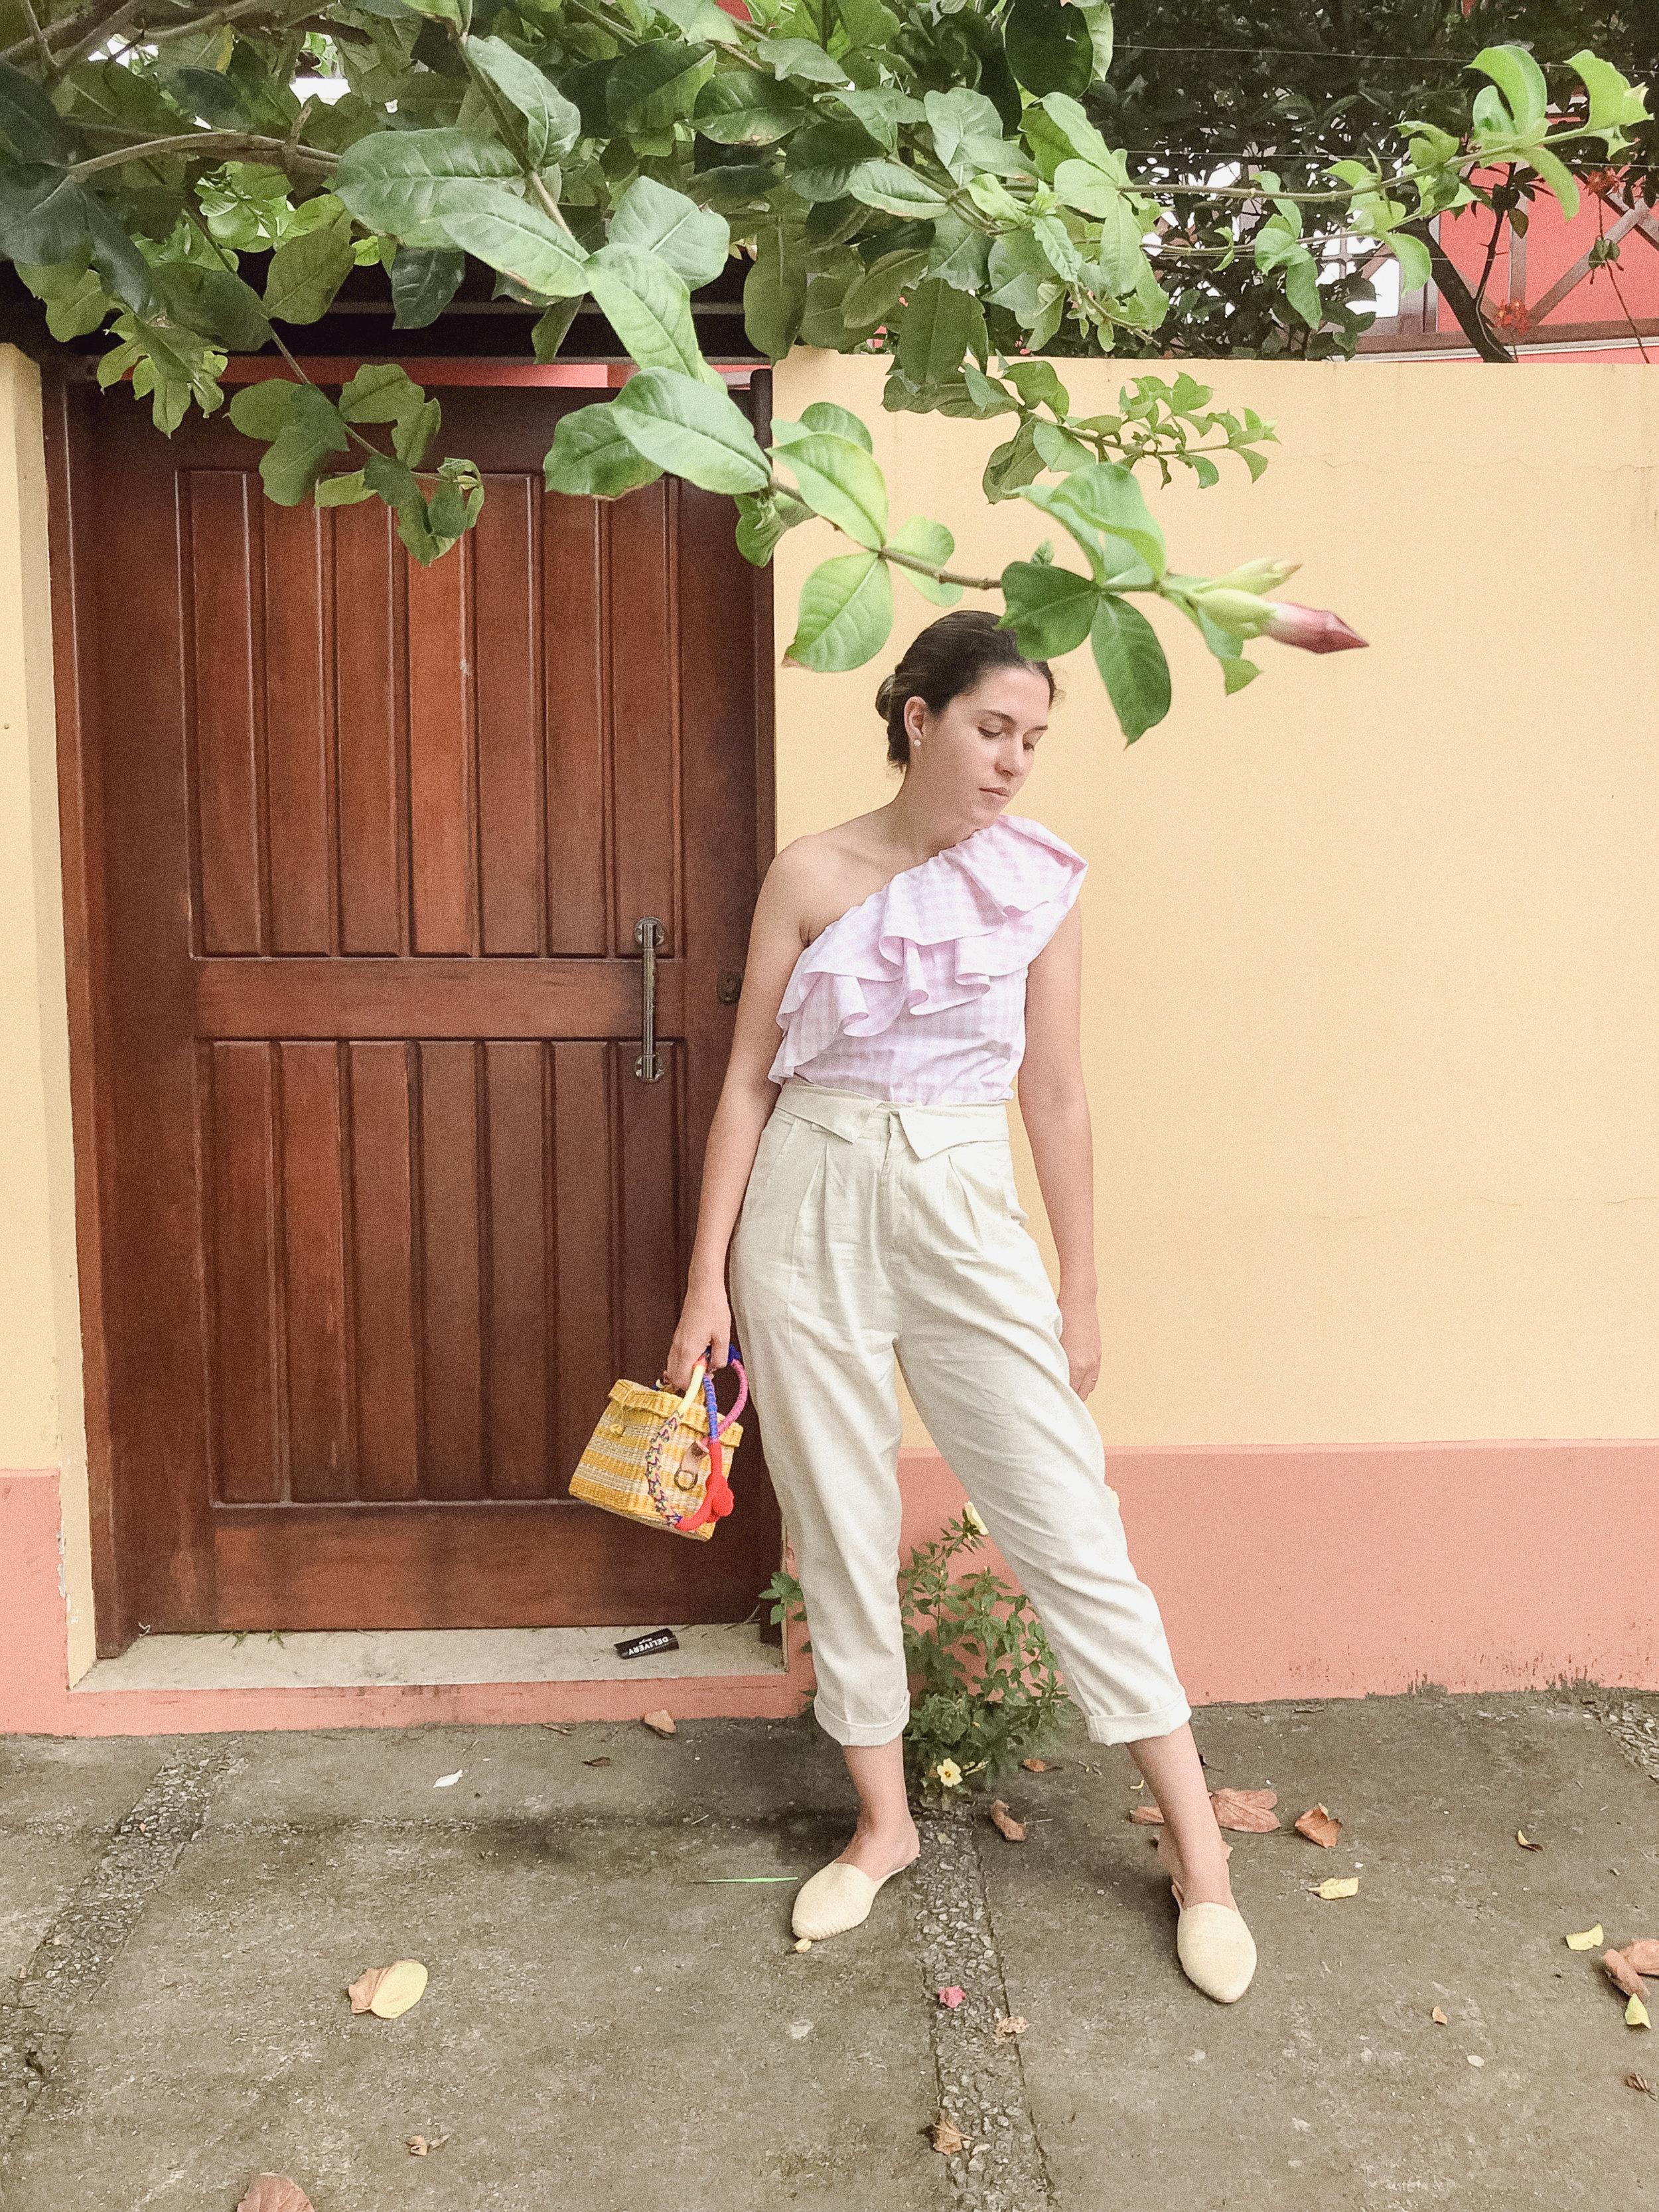 IMG 2635 - Looks da Semana: Poliana Almeida